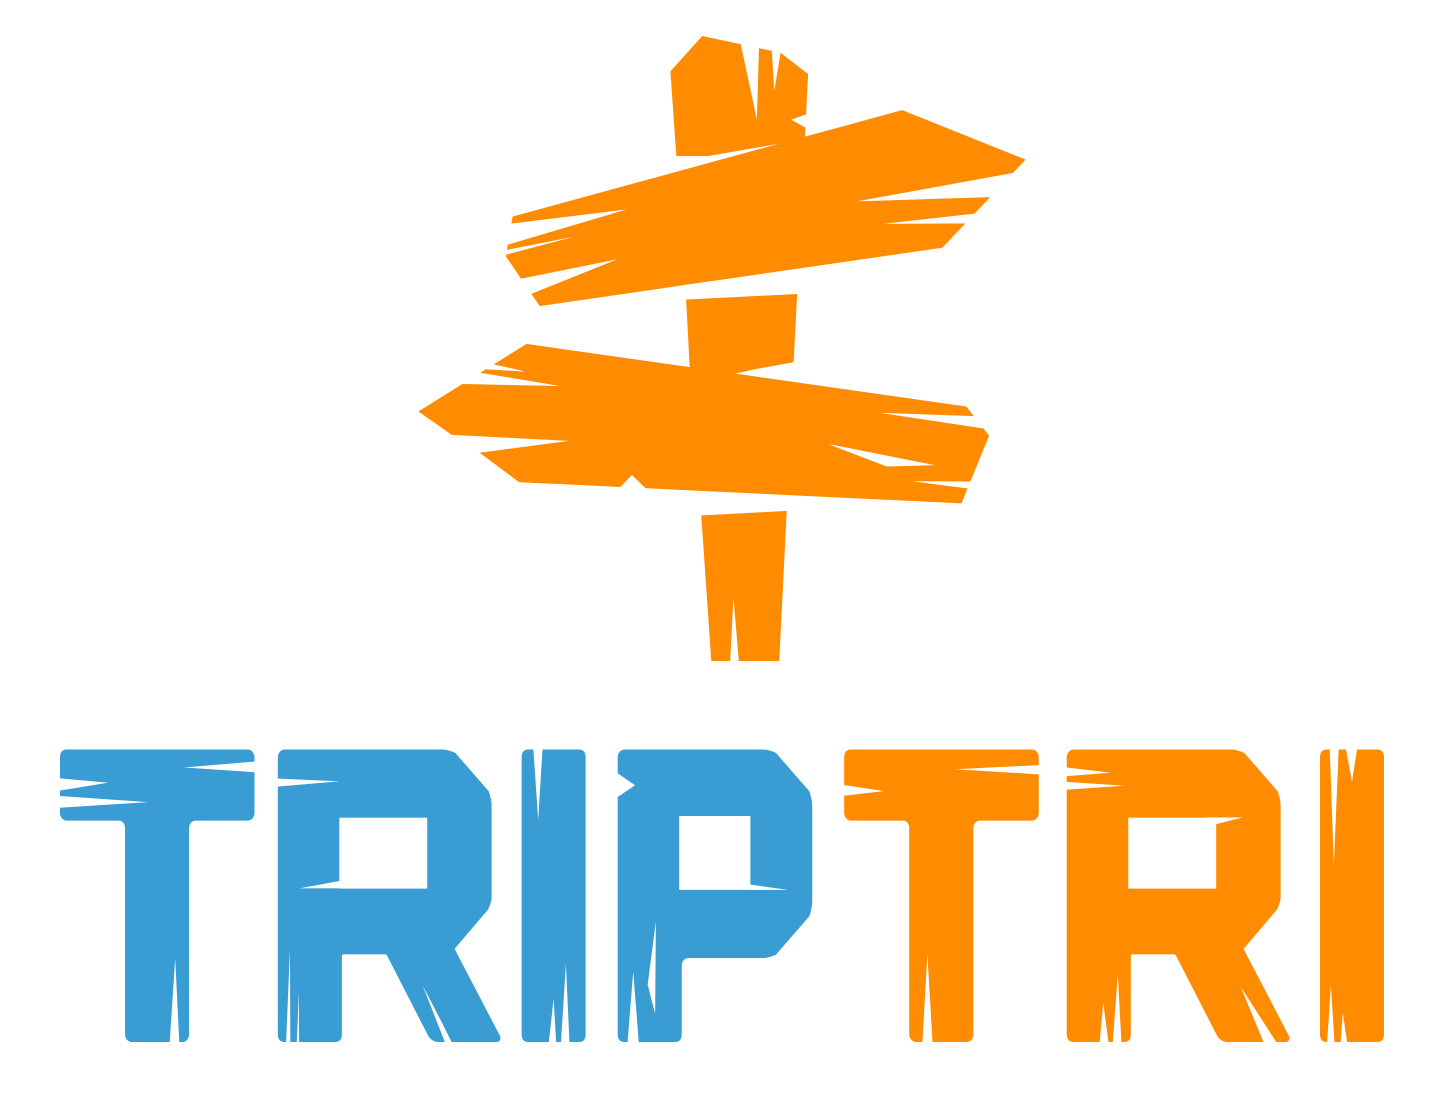 TRIPTRI